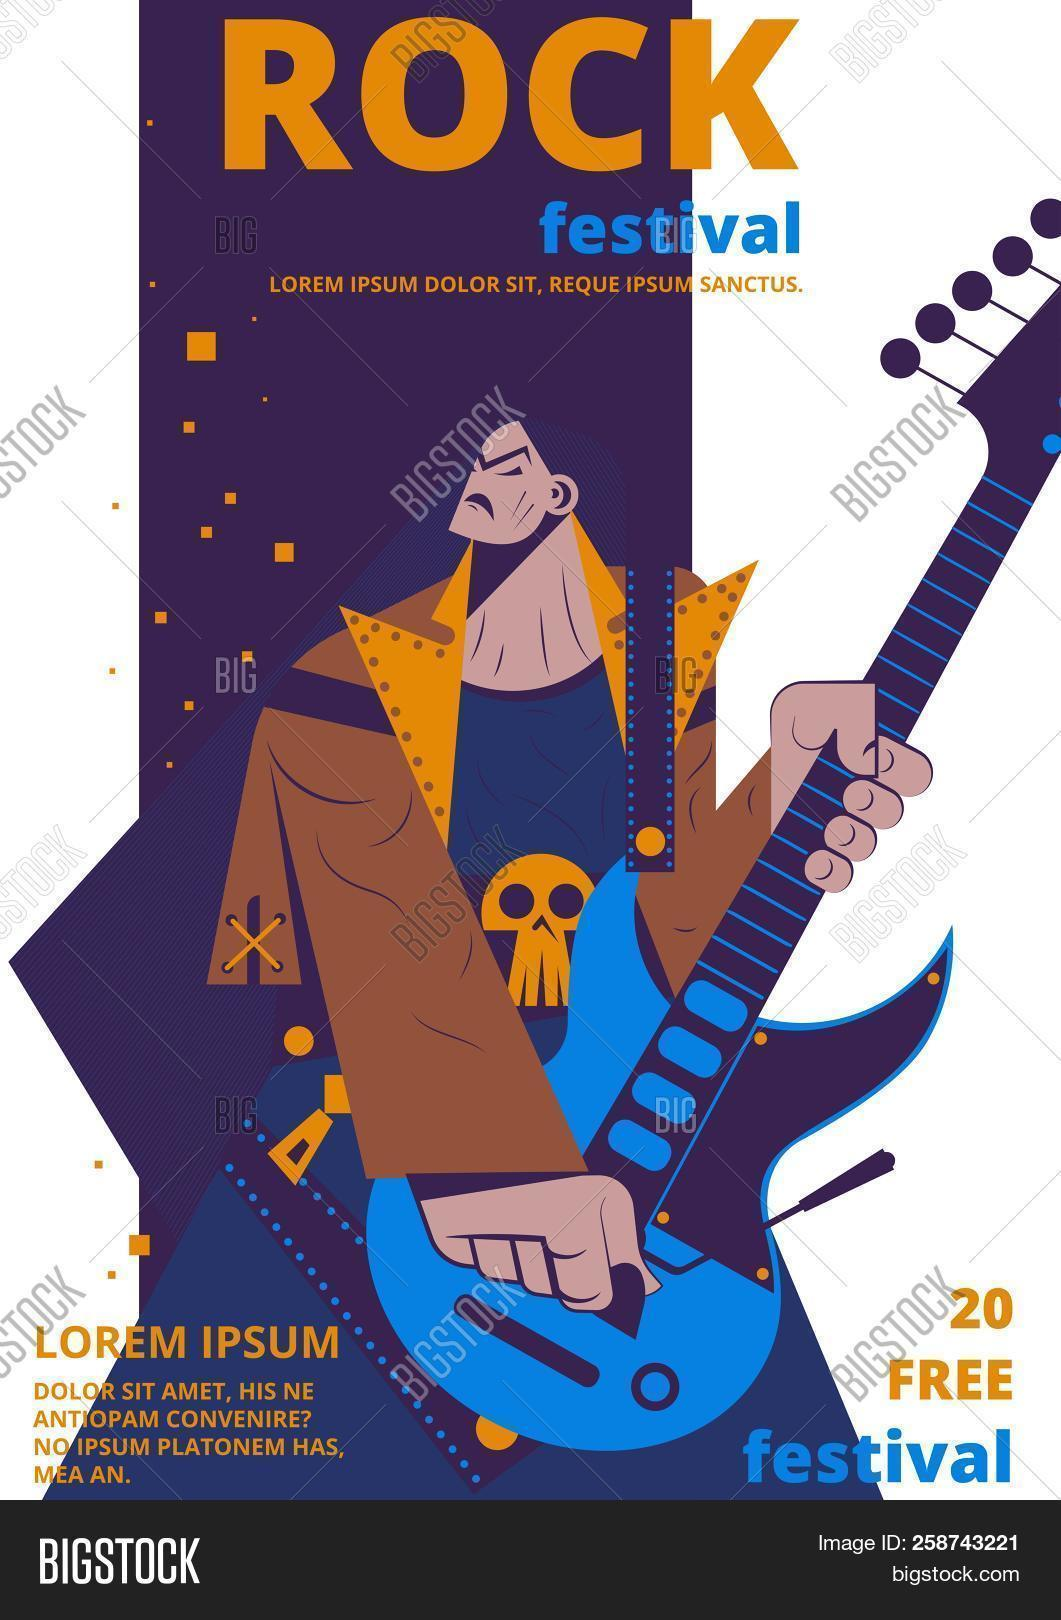 Rock Music Festival Image & Photo (Free Trial)   Bigstock